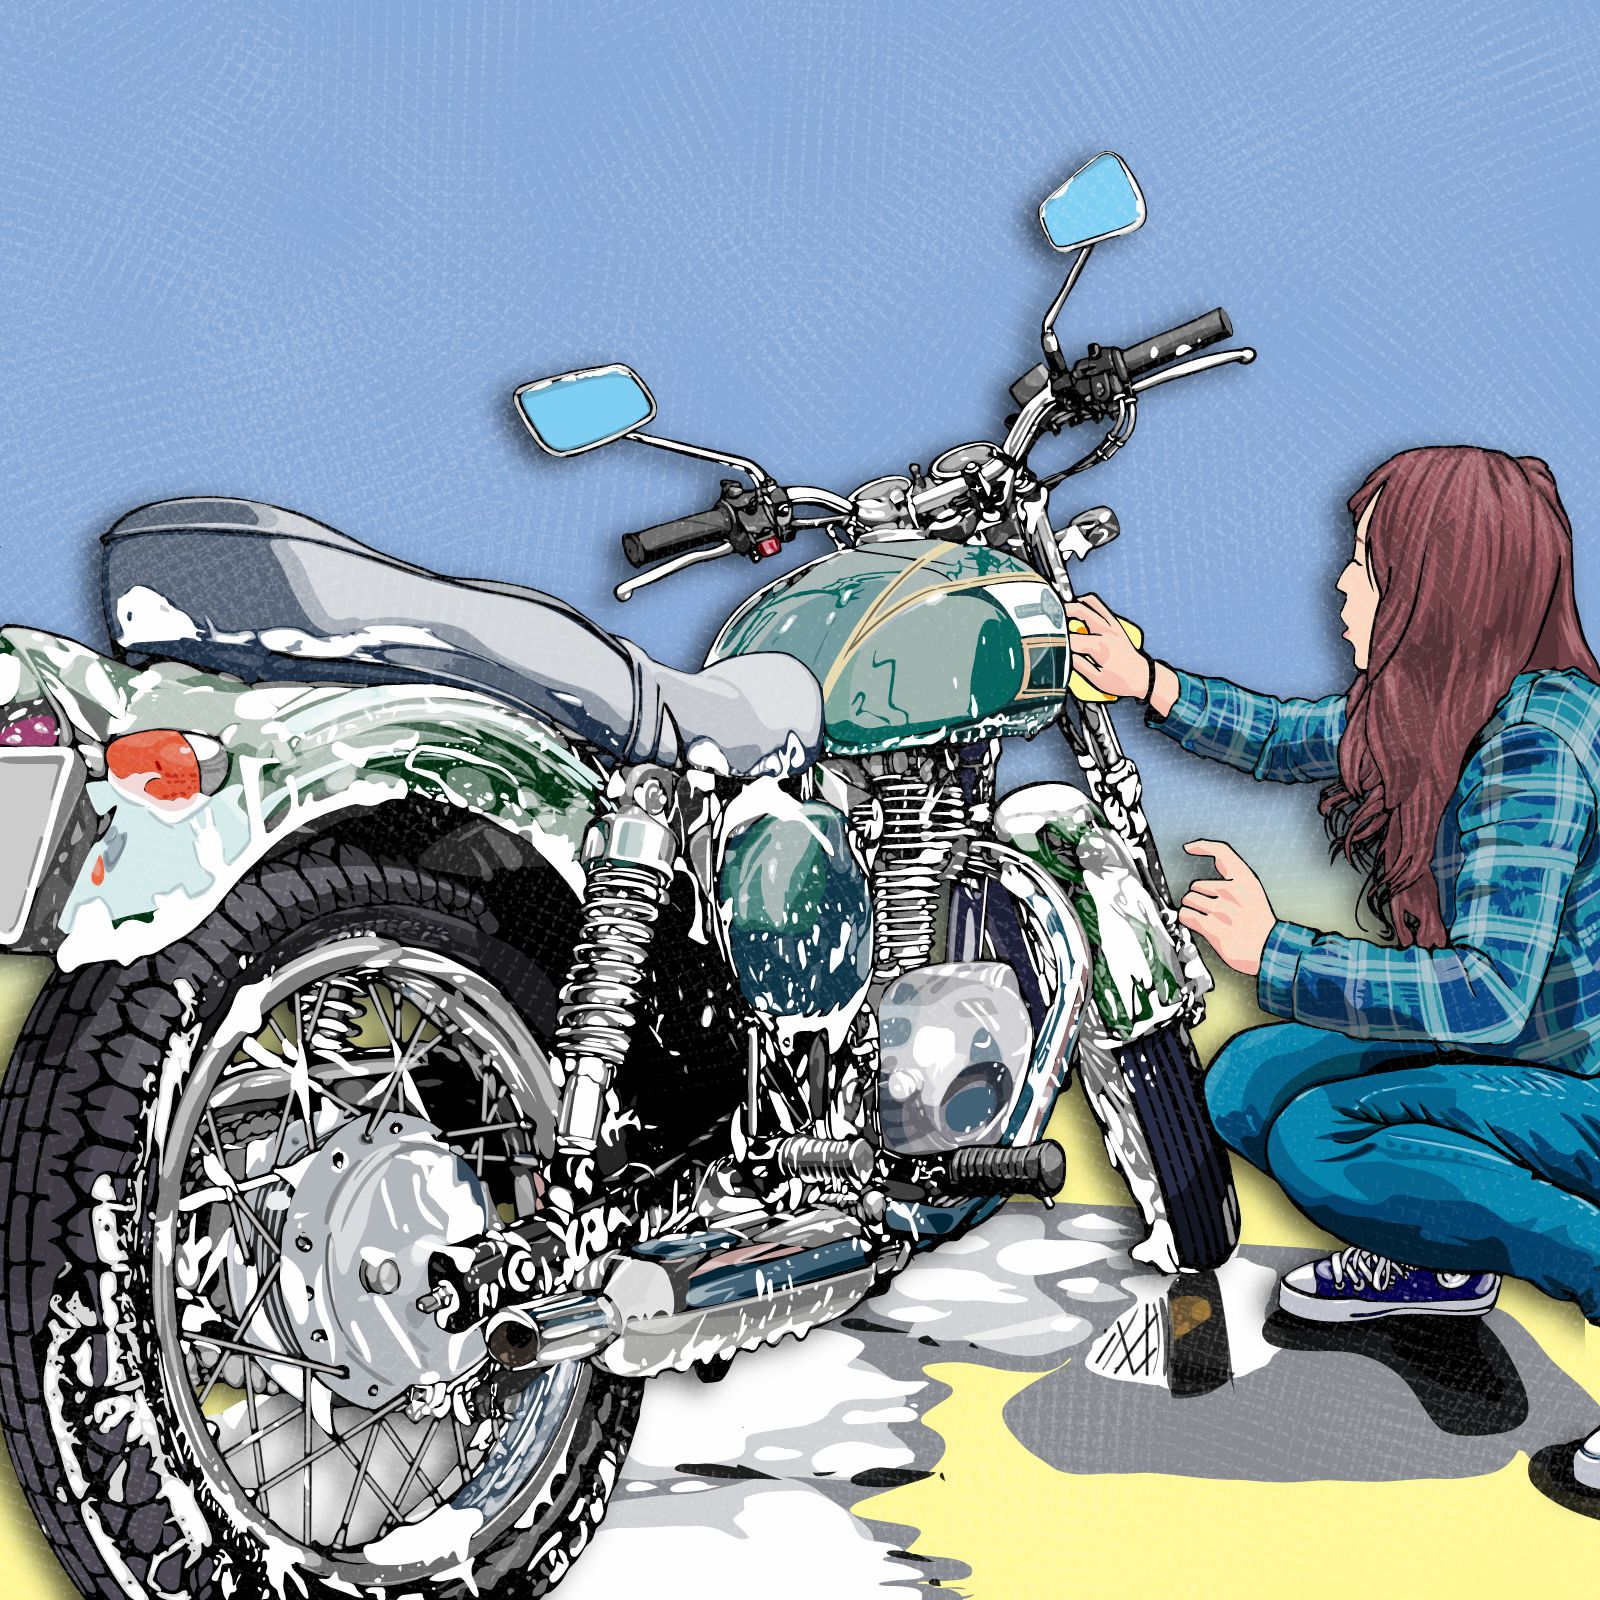 estgrr Anime motorcycle, Cafe racer style, Concept art